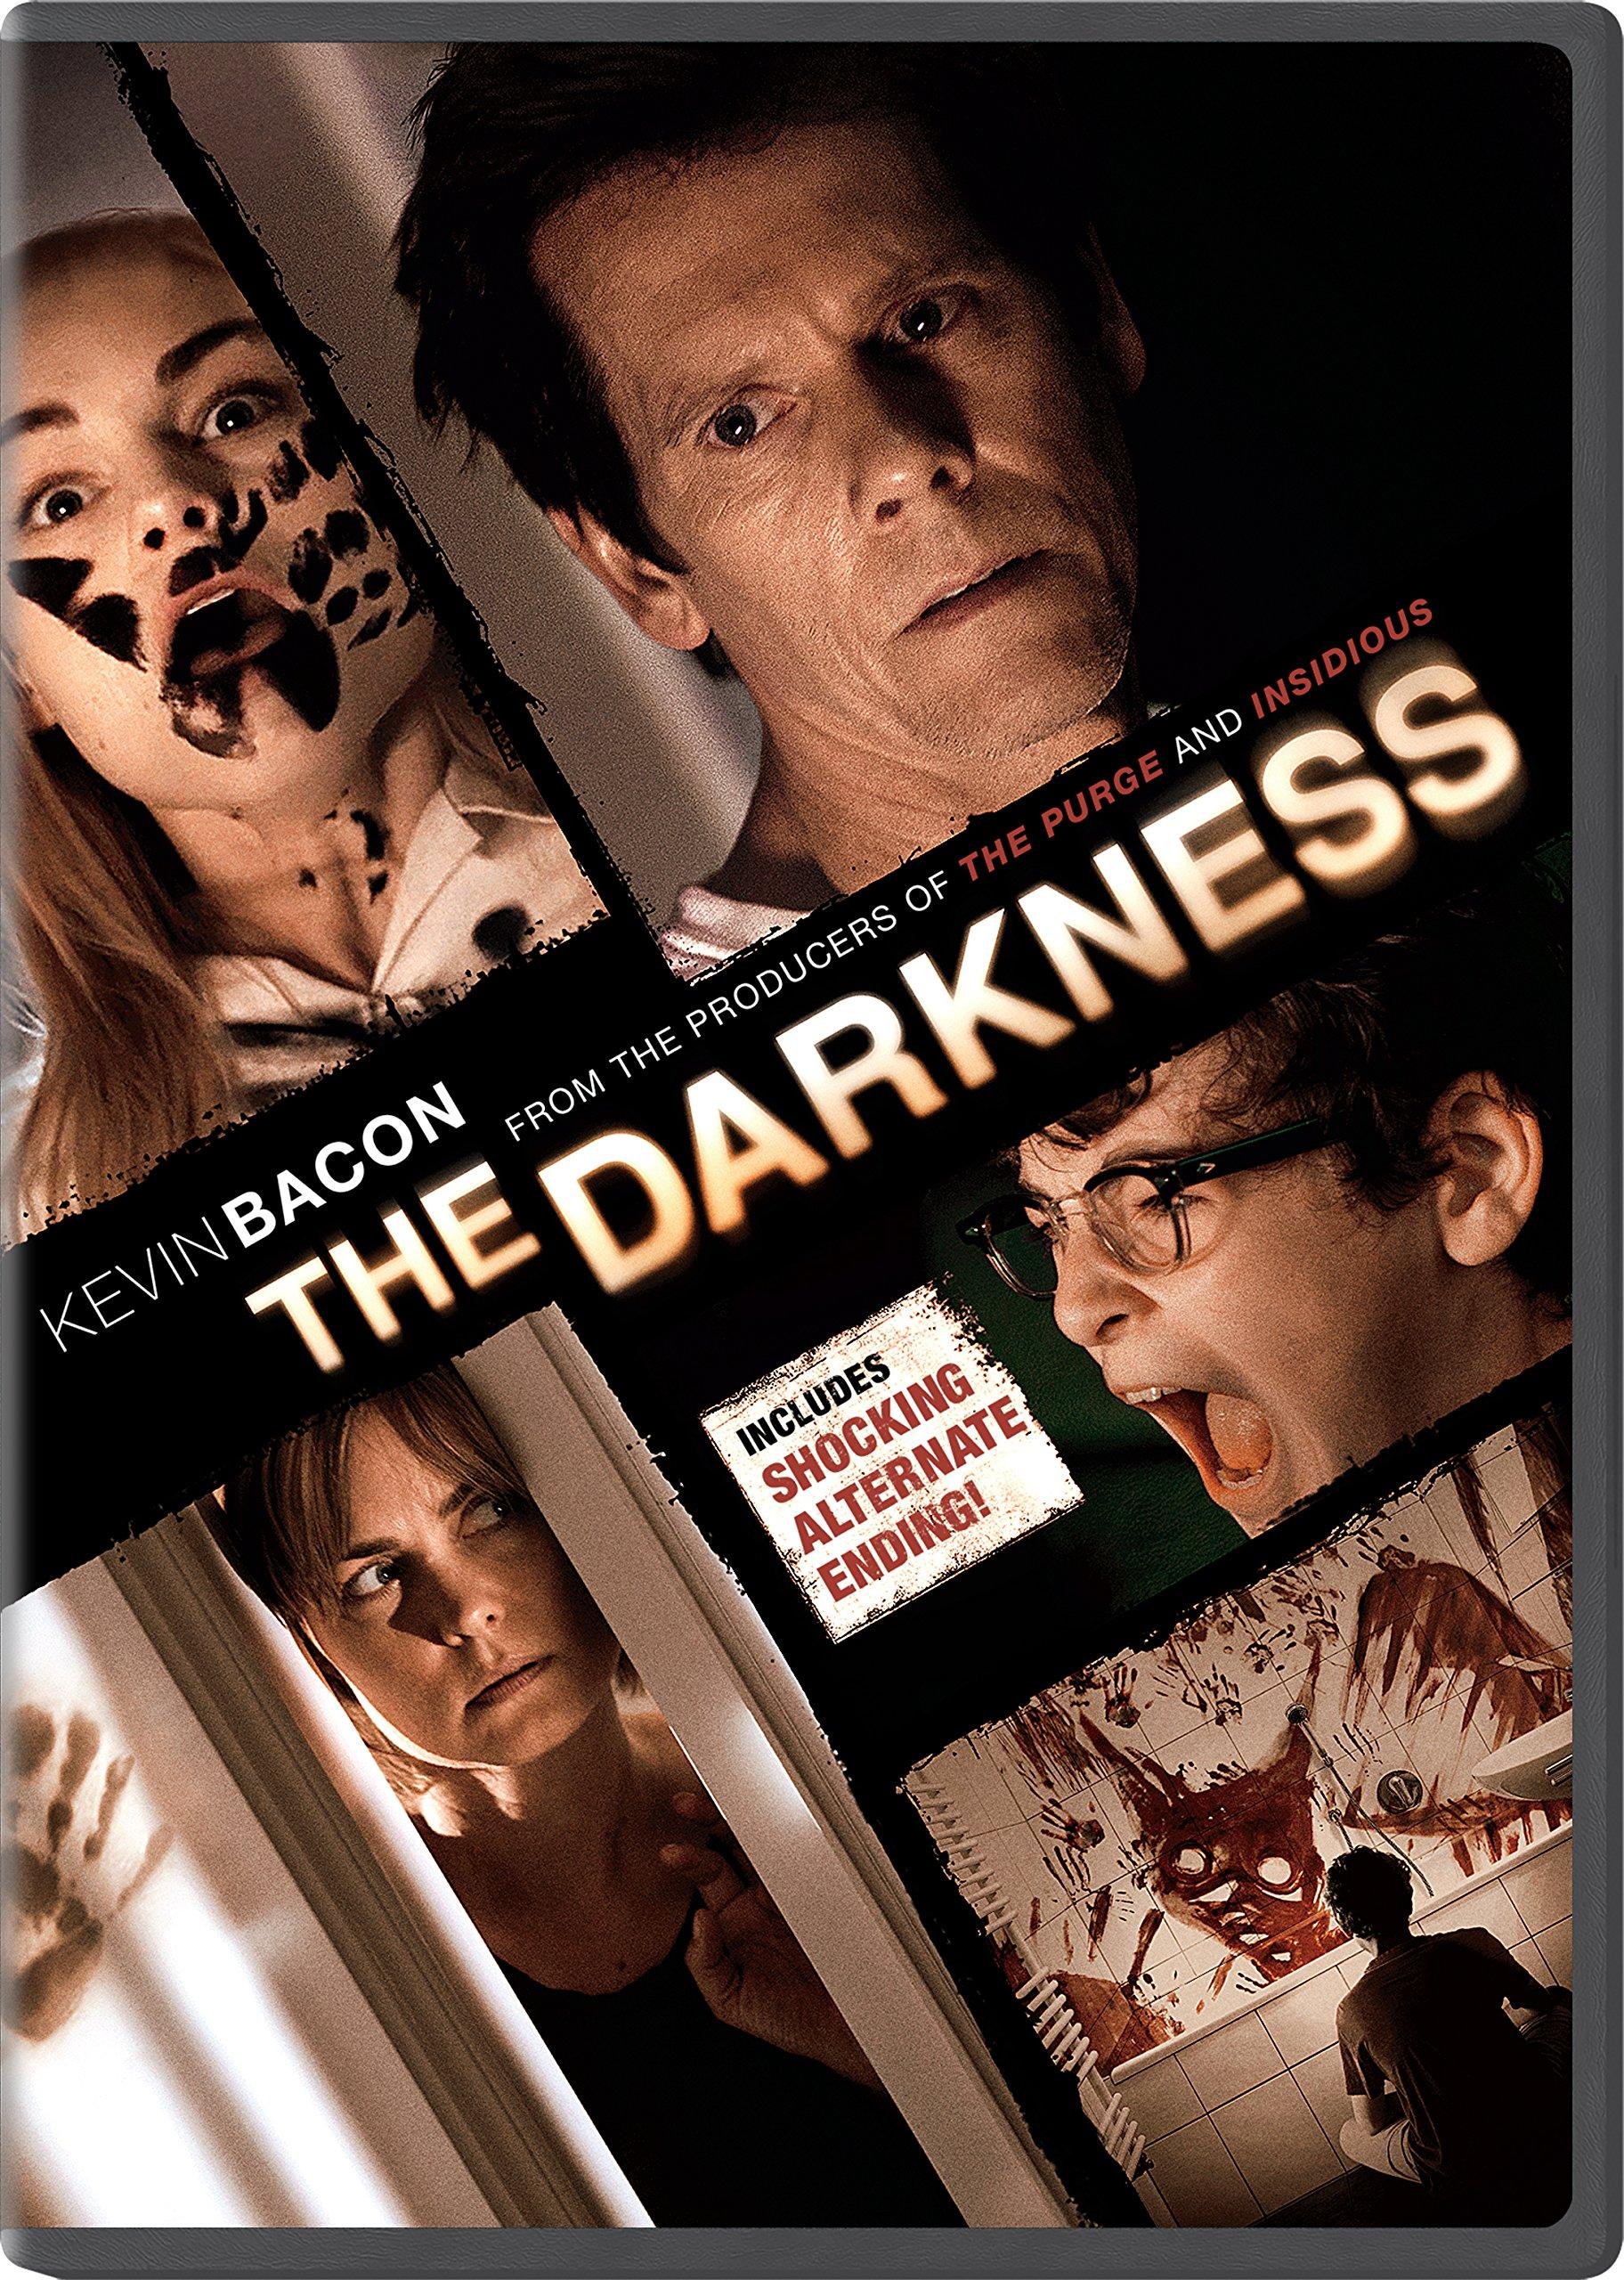 : The Darkness 2016 German Ac3 Dubbed Dl 1080p BluRay x264-MultiPlex